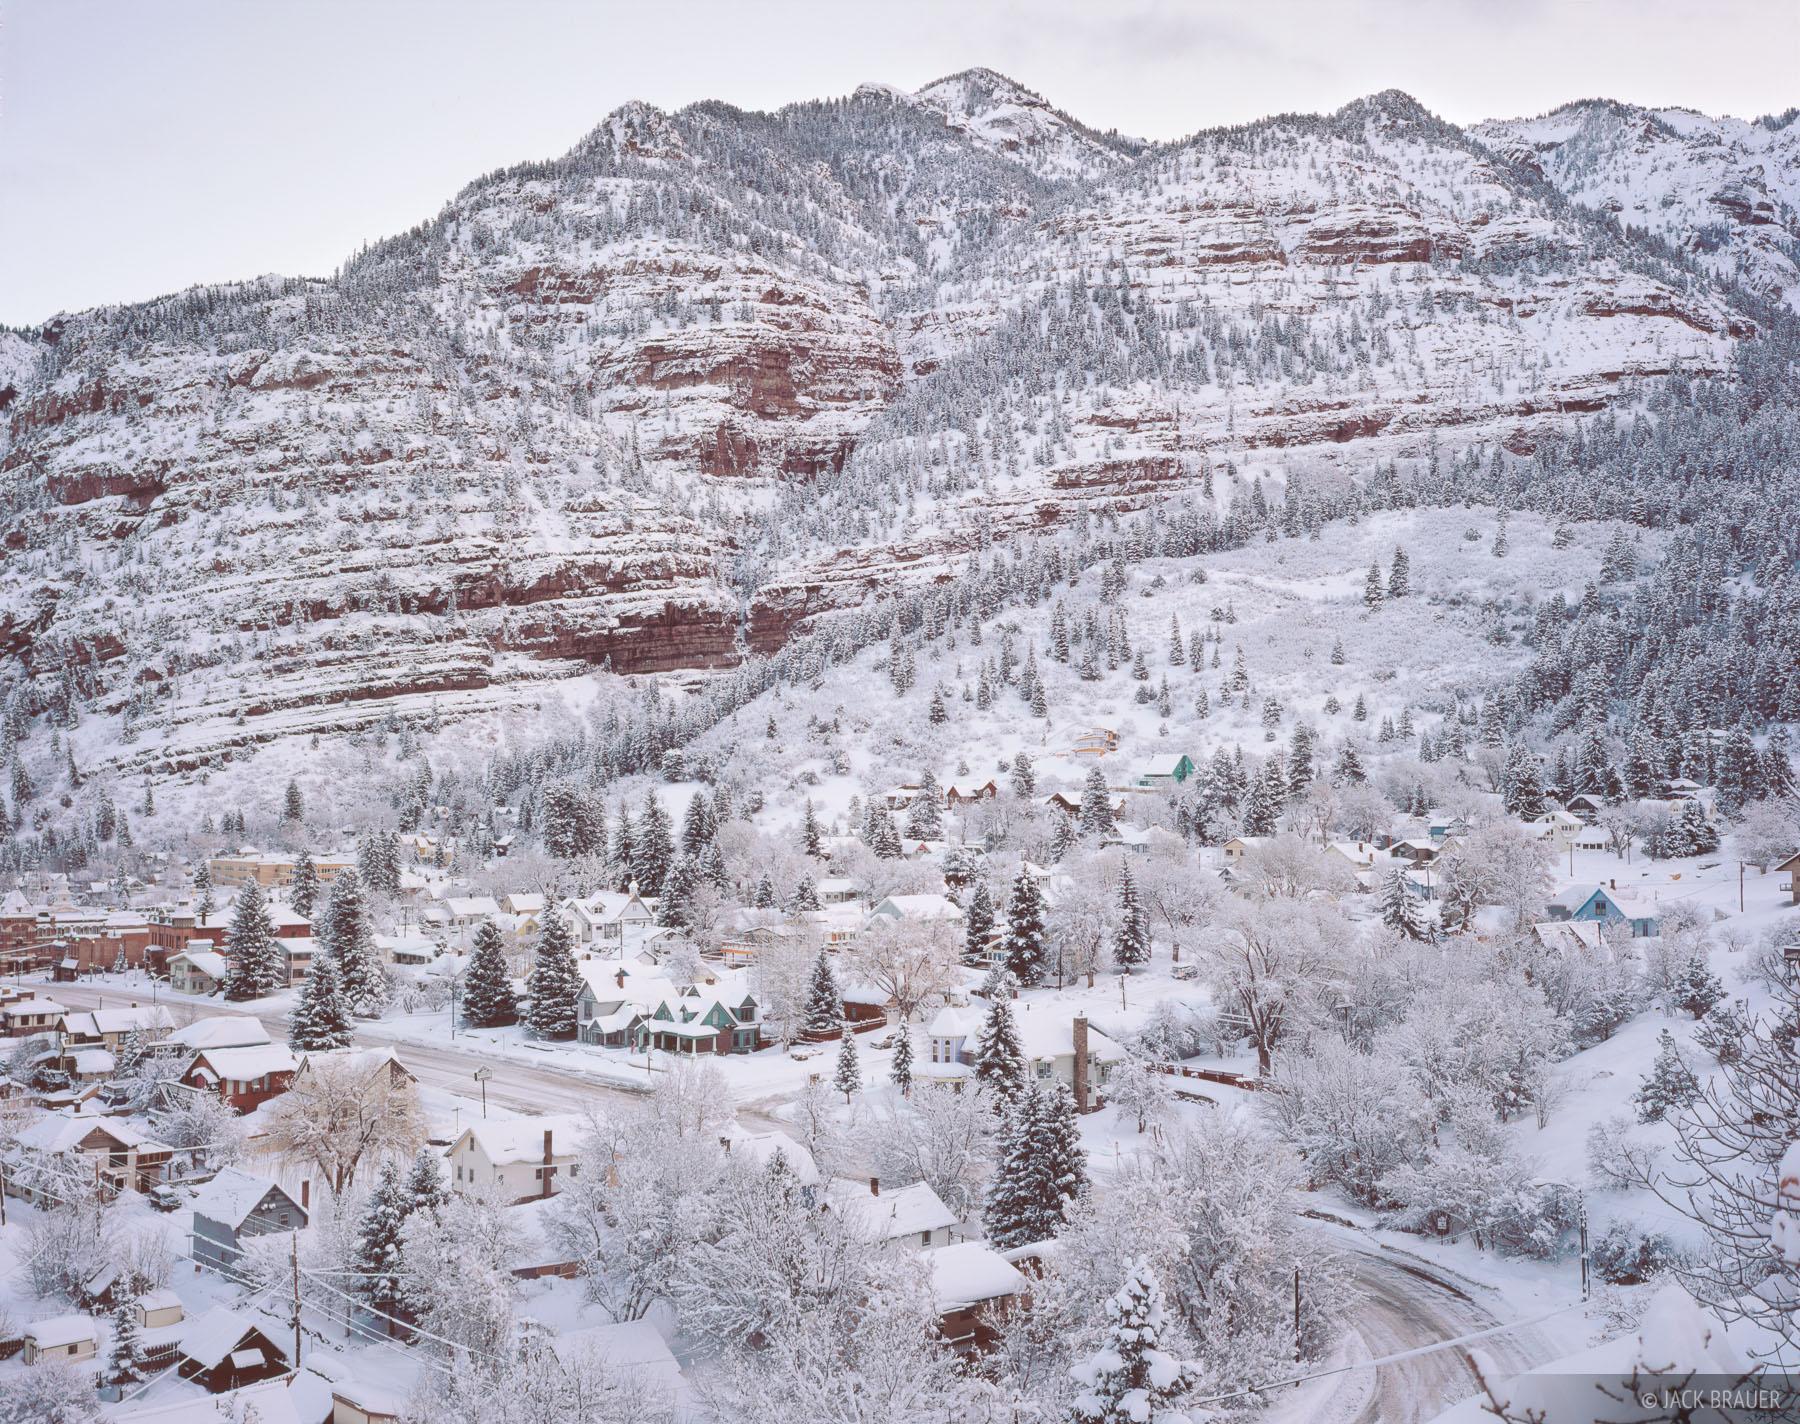 Winter Wonderland, Ouray, Colorado, photo